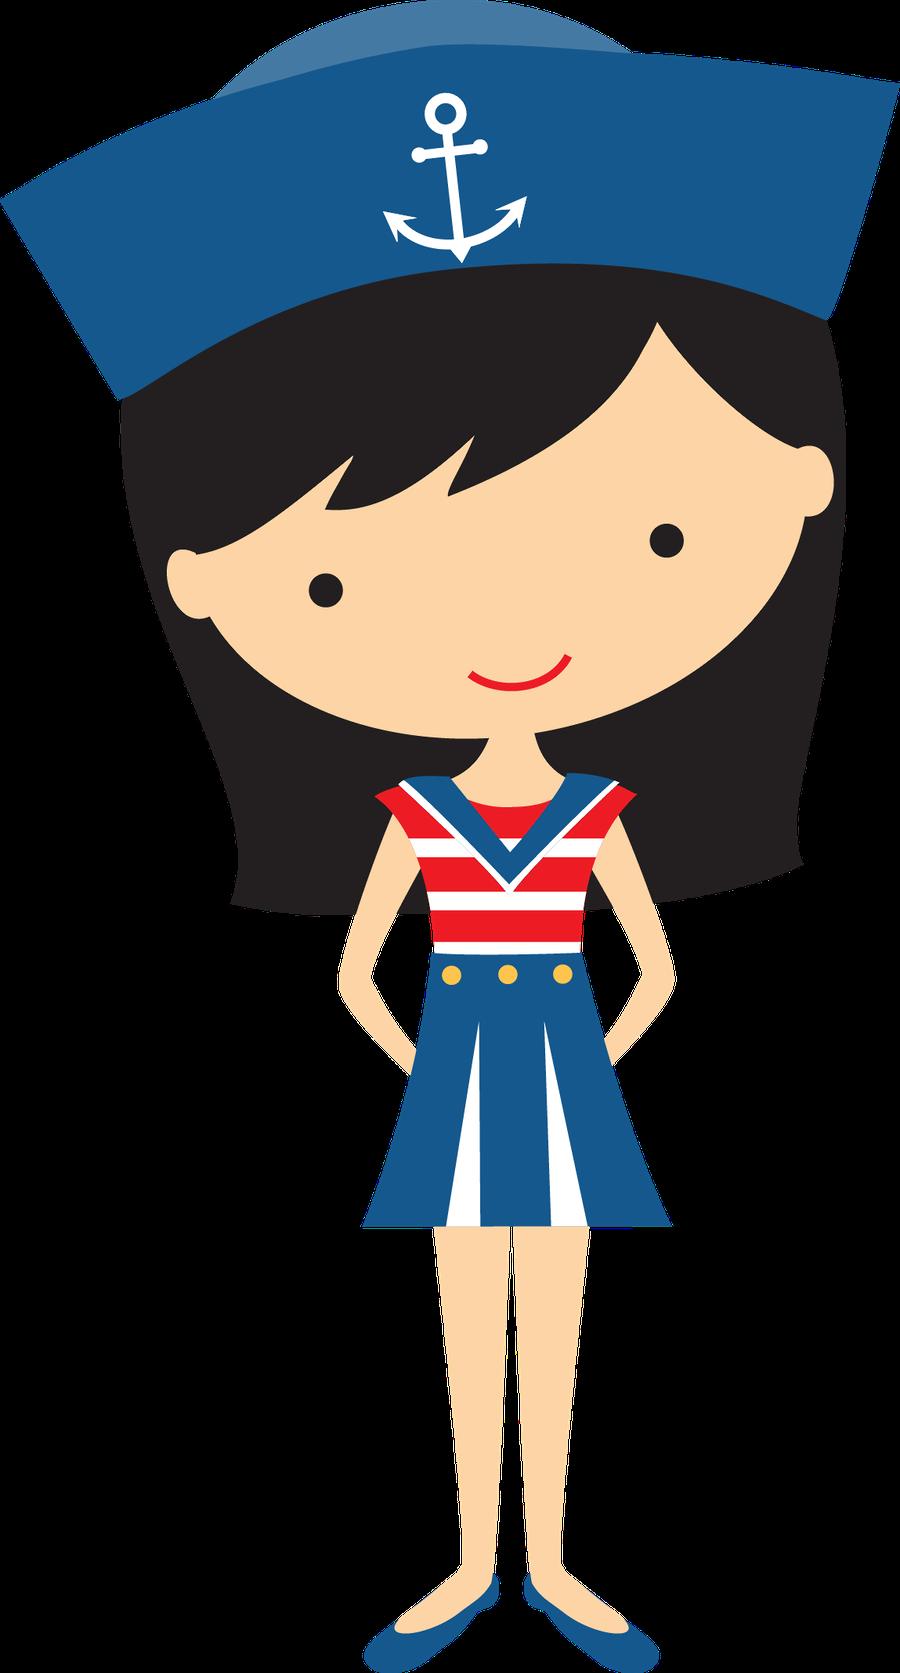 black haired girl sailor bottle cap and images pinterest rh pinterest com sailor clip art free clipart sailor hat